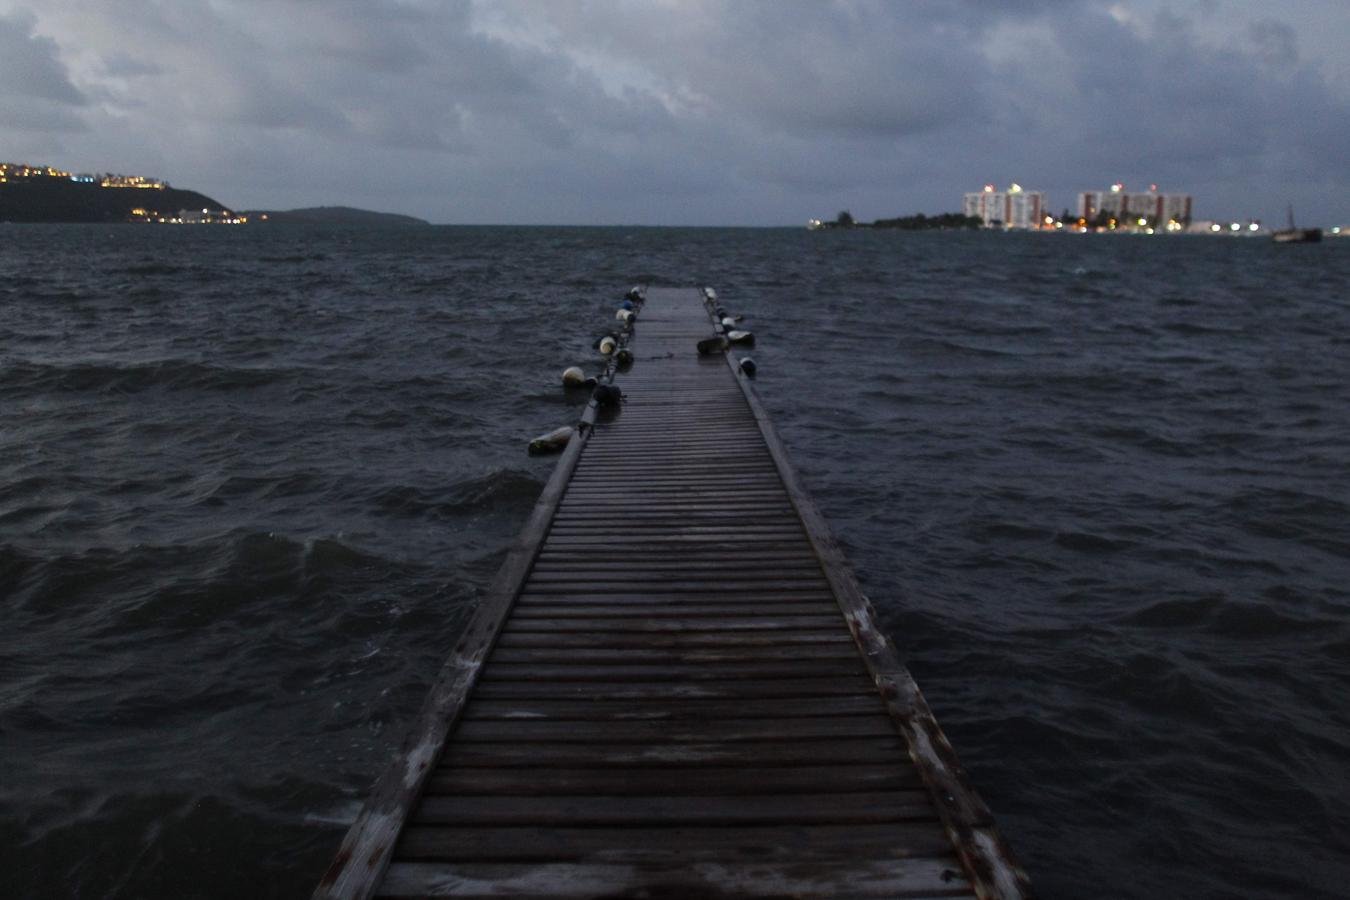 El huracán Irma momentos antes de llegar a Puerto Rico